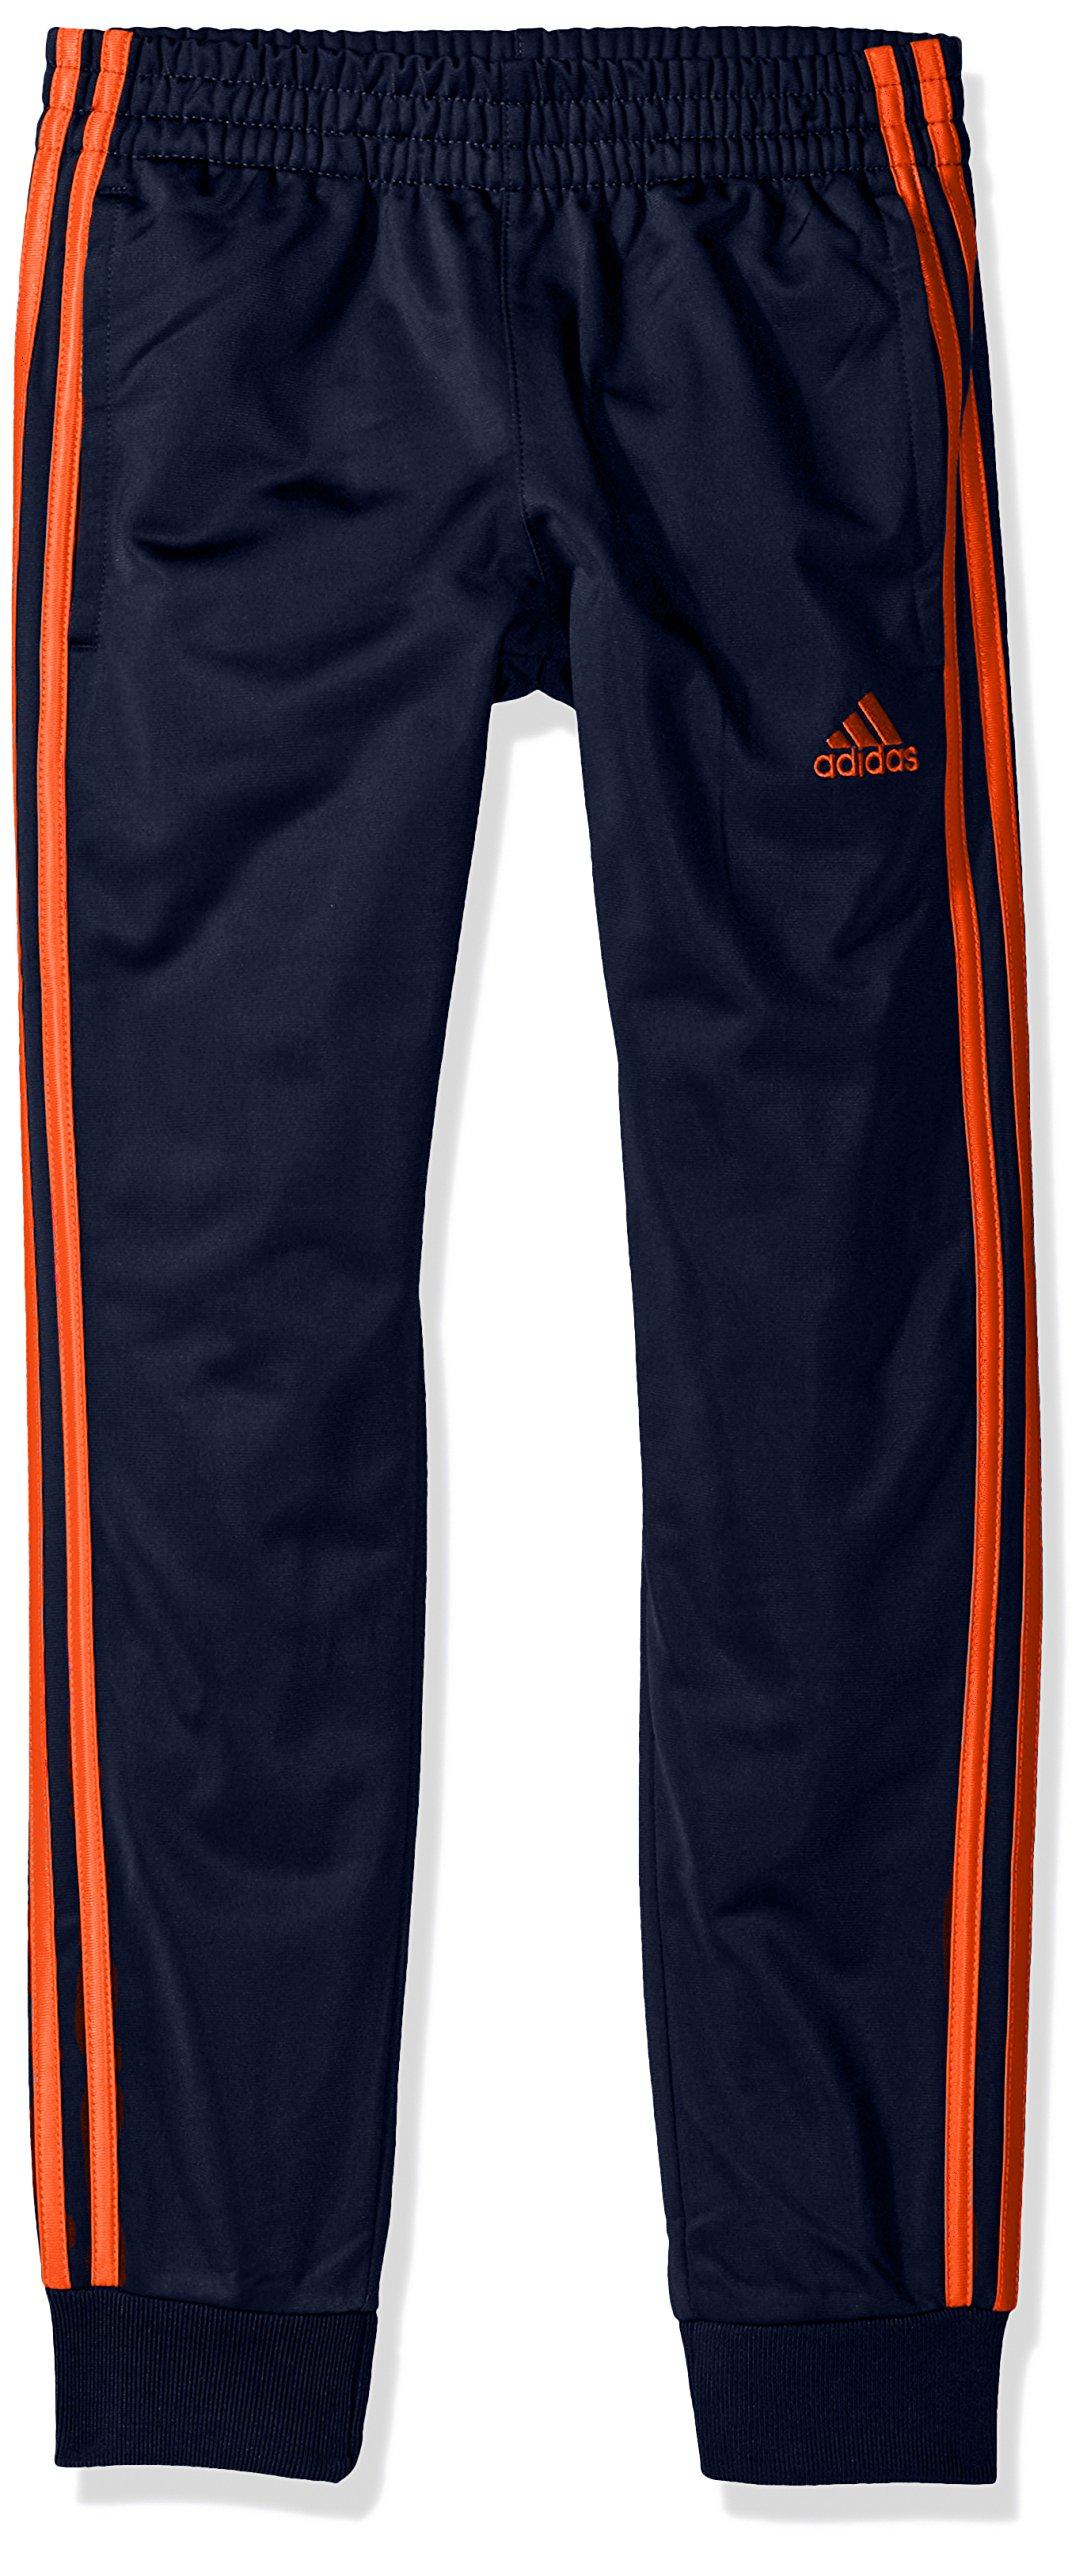 adidas Boys' Big Oldschool Jogger Pant, Navy/Orange OS, S (8/10) by adidas